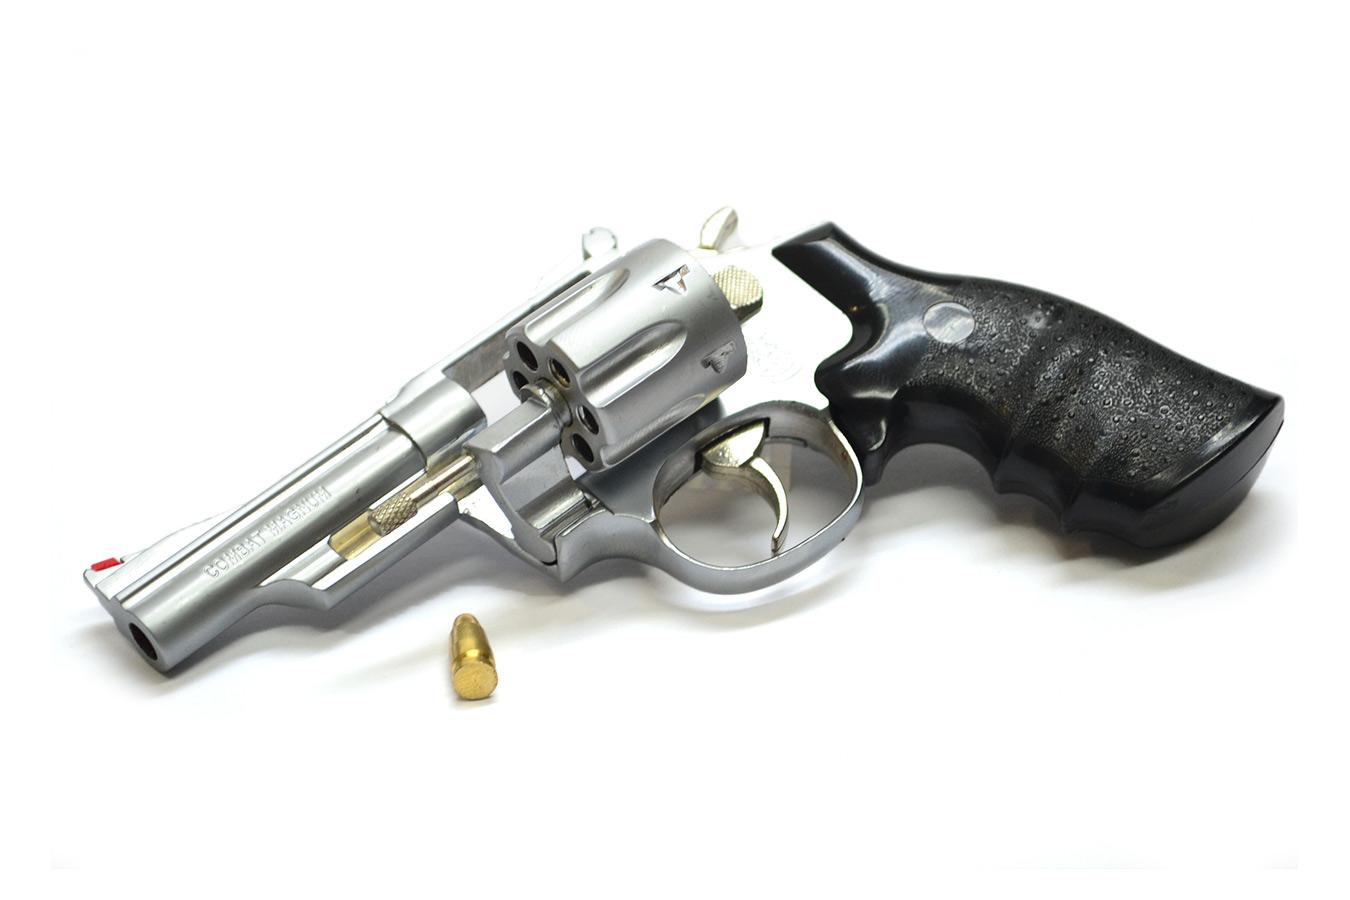 Макет револьвера Smith & Wesson Model 29 в масштабе 1:2